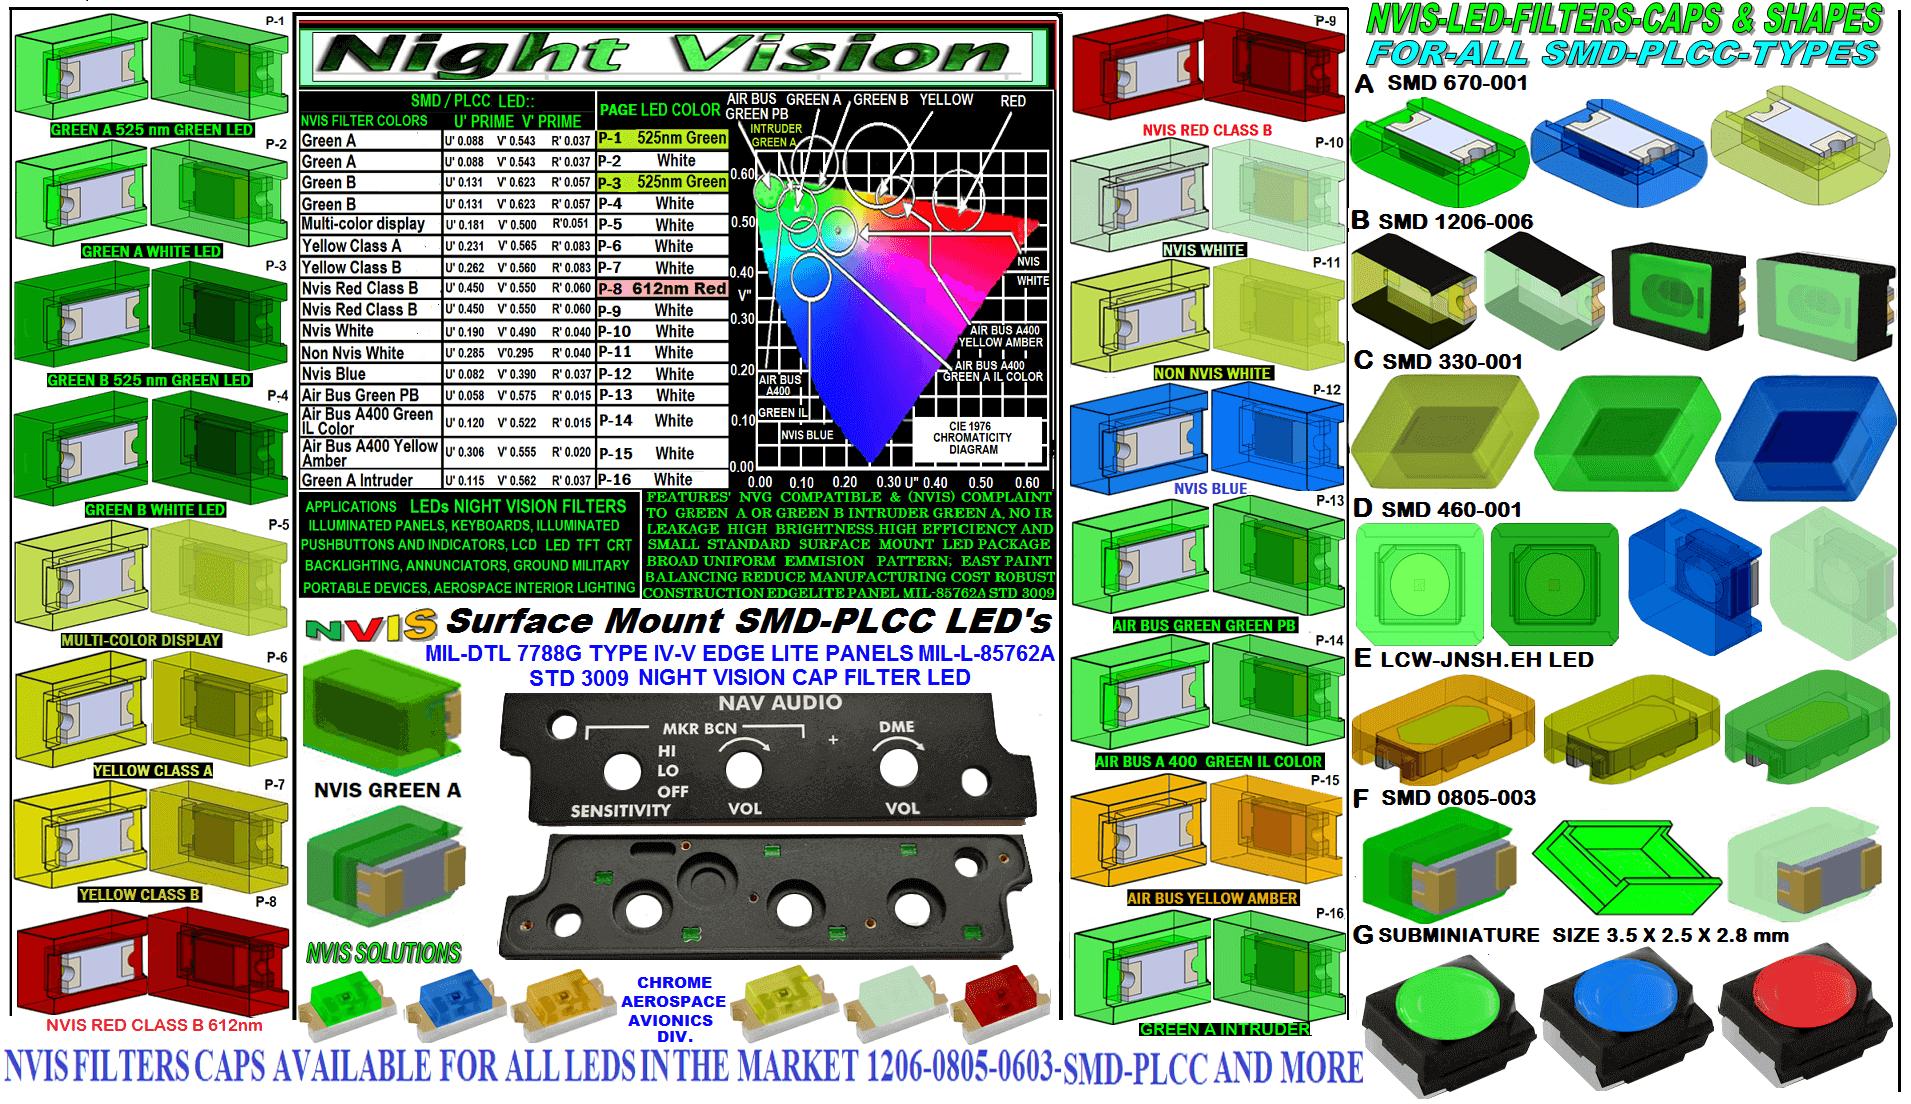 SMD-PLCC LED NVIS GREEN A 525nm FILTER  CAP L-65403-R0603-003  L-65196-A0805-003 L-65330-A0805-003 L-65197-B0805-003 L-65250-B0805-003  L-65196-A0603-003 L-65330-A0603-003 L-65197-B0603-003 L-65250-B0603-003 L-65648-W0603-003 L-65951-W0603-003 L-65401-Y0603-003 L-65402-Y0603-003 L-65403-R0603-003 L-65196-A0805-003 L-65330-A0805-003 L-65197-B0805-003 L-65250-B0805-003 L-65648-W0805-003 L-65951-W0805-003 L-65401-Y0805-003 L-65402-Y0805-003 L-65403-R0805-003 L-65196-A1206-002 L-65330-A1206-002  L-65197-B1206-002 L-65250-B1206-002 L-65648-W1206-002 L-65951-W1206-002 L-65401-Y1206-002 L-65402-Y1206-002 L-65403-R1206-002  SMD-PLCC LED NVIS GREEN A 525nm FILTER  CAP 1206 SMD LED NVIS GREEN A 525 NM FILTER 1206 SMD LED NVIS GREEN A 525NM PCB 1206 SMD-PLCC LED NVIS GREEN A 525 NM FILTER 1206 SMD-PLCC LED NVIS GREEN A 525 NM PCB NVIS GREEN A 525 nm SMD-PLCC LED FILTER CAP DATA SHEET 1206 SMD LED NVIS GREEN A 525 NM FILTER  1206 SMD LED NVIS GREEN A 525 NM PCB  1206 SMD-PLCC LED NVIS GREEN A 525 NM FILTER  1206 SMD-PLCC LED NVIS GREEN A 525 NM PCB  SMD-PLCC LED NVIS GREEN A 525nm FILTER CAP  0402 LED 1210 LED 1806 LED 1812 LED 2512 LED 0201 LED 5730 LED 3014 LED OSRAM LCW JNSH.EC-BTCP-5H7I-1 LED Toshiba TL3GB-NW1,L- LED Sharp LED TOSHIBA LED Lumileds LED Seoul Semiconductor LED SUNLIKE LED LG Innotek LED Edison Opto BRIDGE LED L-65196-A1206-003 L-65330-A1206-003 L-65197-B1206-003 L-65250-B1206-003 L-65648-W1206-003 L-65951-W1206-003 L-65401-Y1206-003 L-65402-Y1206-003 1.1206-002 SMD LED NVIS GREEN A 525 NM FILTER 1.1206-002 SMD LED NVIS GREEN A 525NM PCB 1.1206-002 SMD-PLCC LED NVIS GREEN A 525 NM FILTER 1.1206-002 SMD-PLCC LED NVIS GREEN A 525 NM PCB  1206-003 SMD LED NVIS GREEN A 525 NM FILTER 1206-003 SMD LED NVIS GREEN A 525NM PCB  1206-003 SMD-PLCC LED NVIS GREEN A 525 NM FILTER   1206-003 SMD-PLCC LED NVIS GREEN A 525 NM PCB L-65403-R1206-003   L-65196-A320-001 L-65330-A320-001 L-65197-B320-001 40 L-65250-B320-001 L-65648-W320-001 L-65951-W320-001 L-65401-Y320-001 NVIS 0